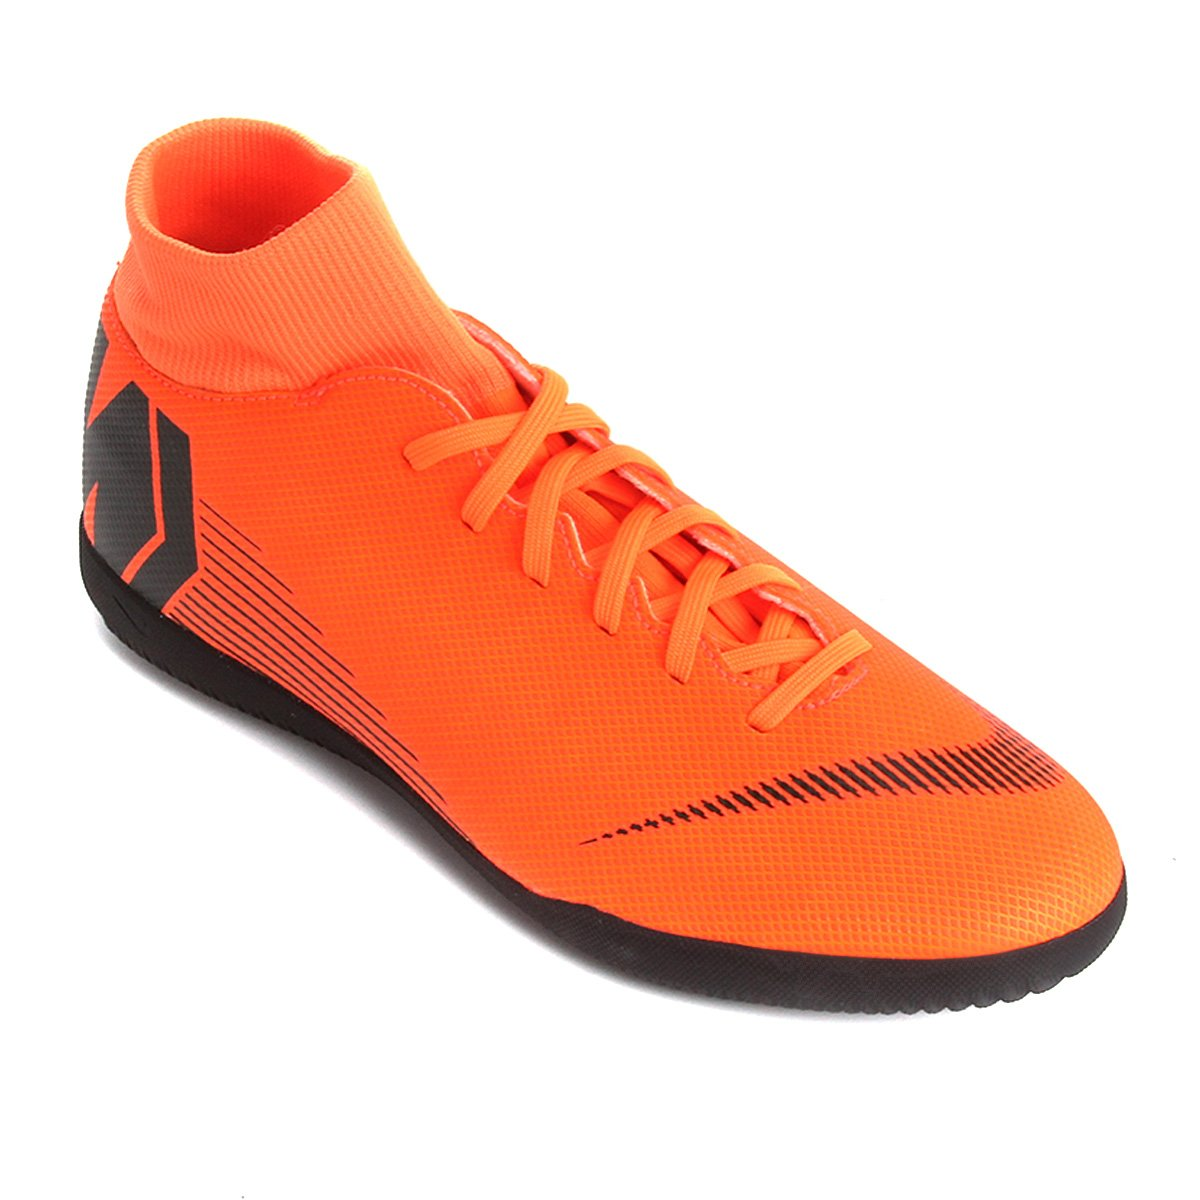 ba1bb5556e ... shop chuteira futsal nike mercurial superfly 6 club masculina 23920  e2a3d